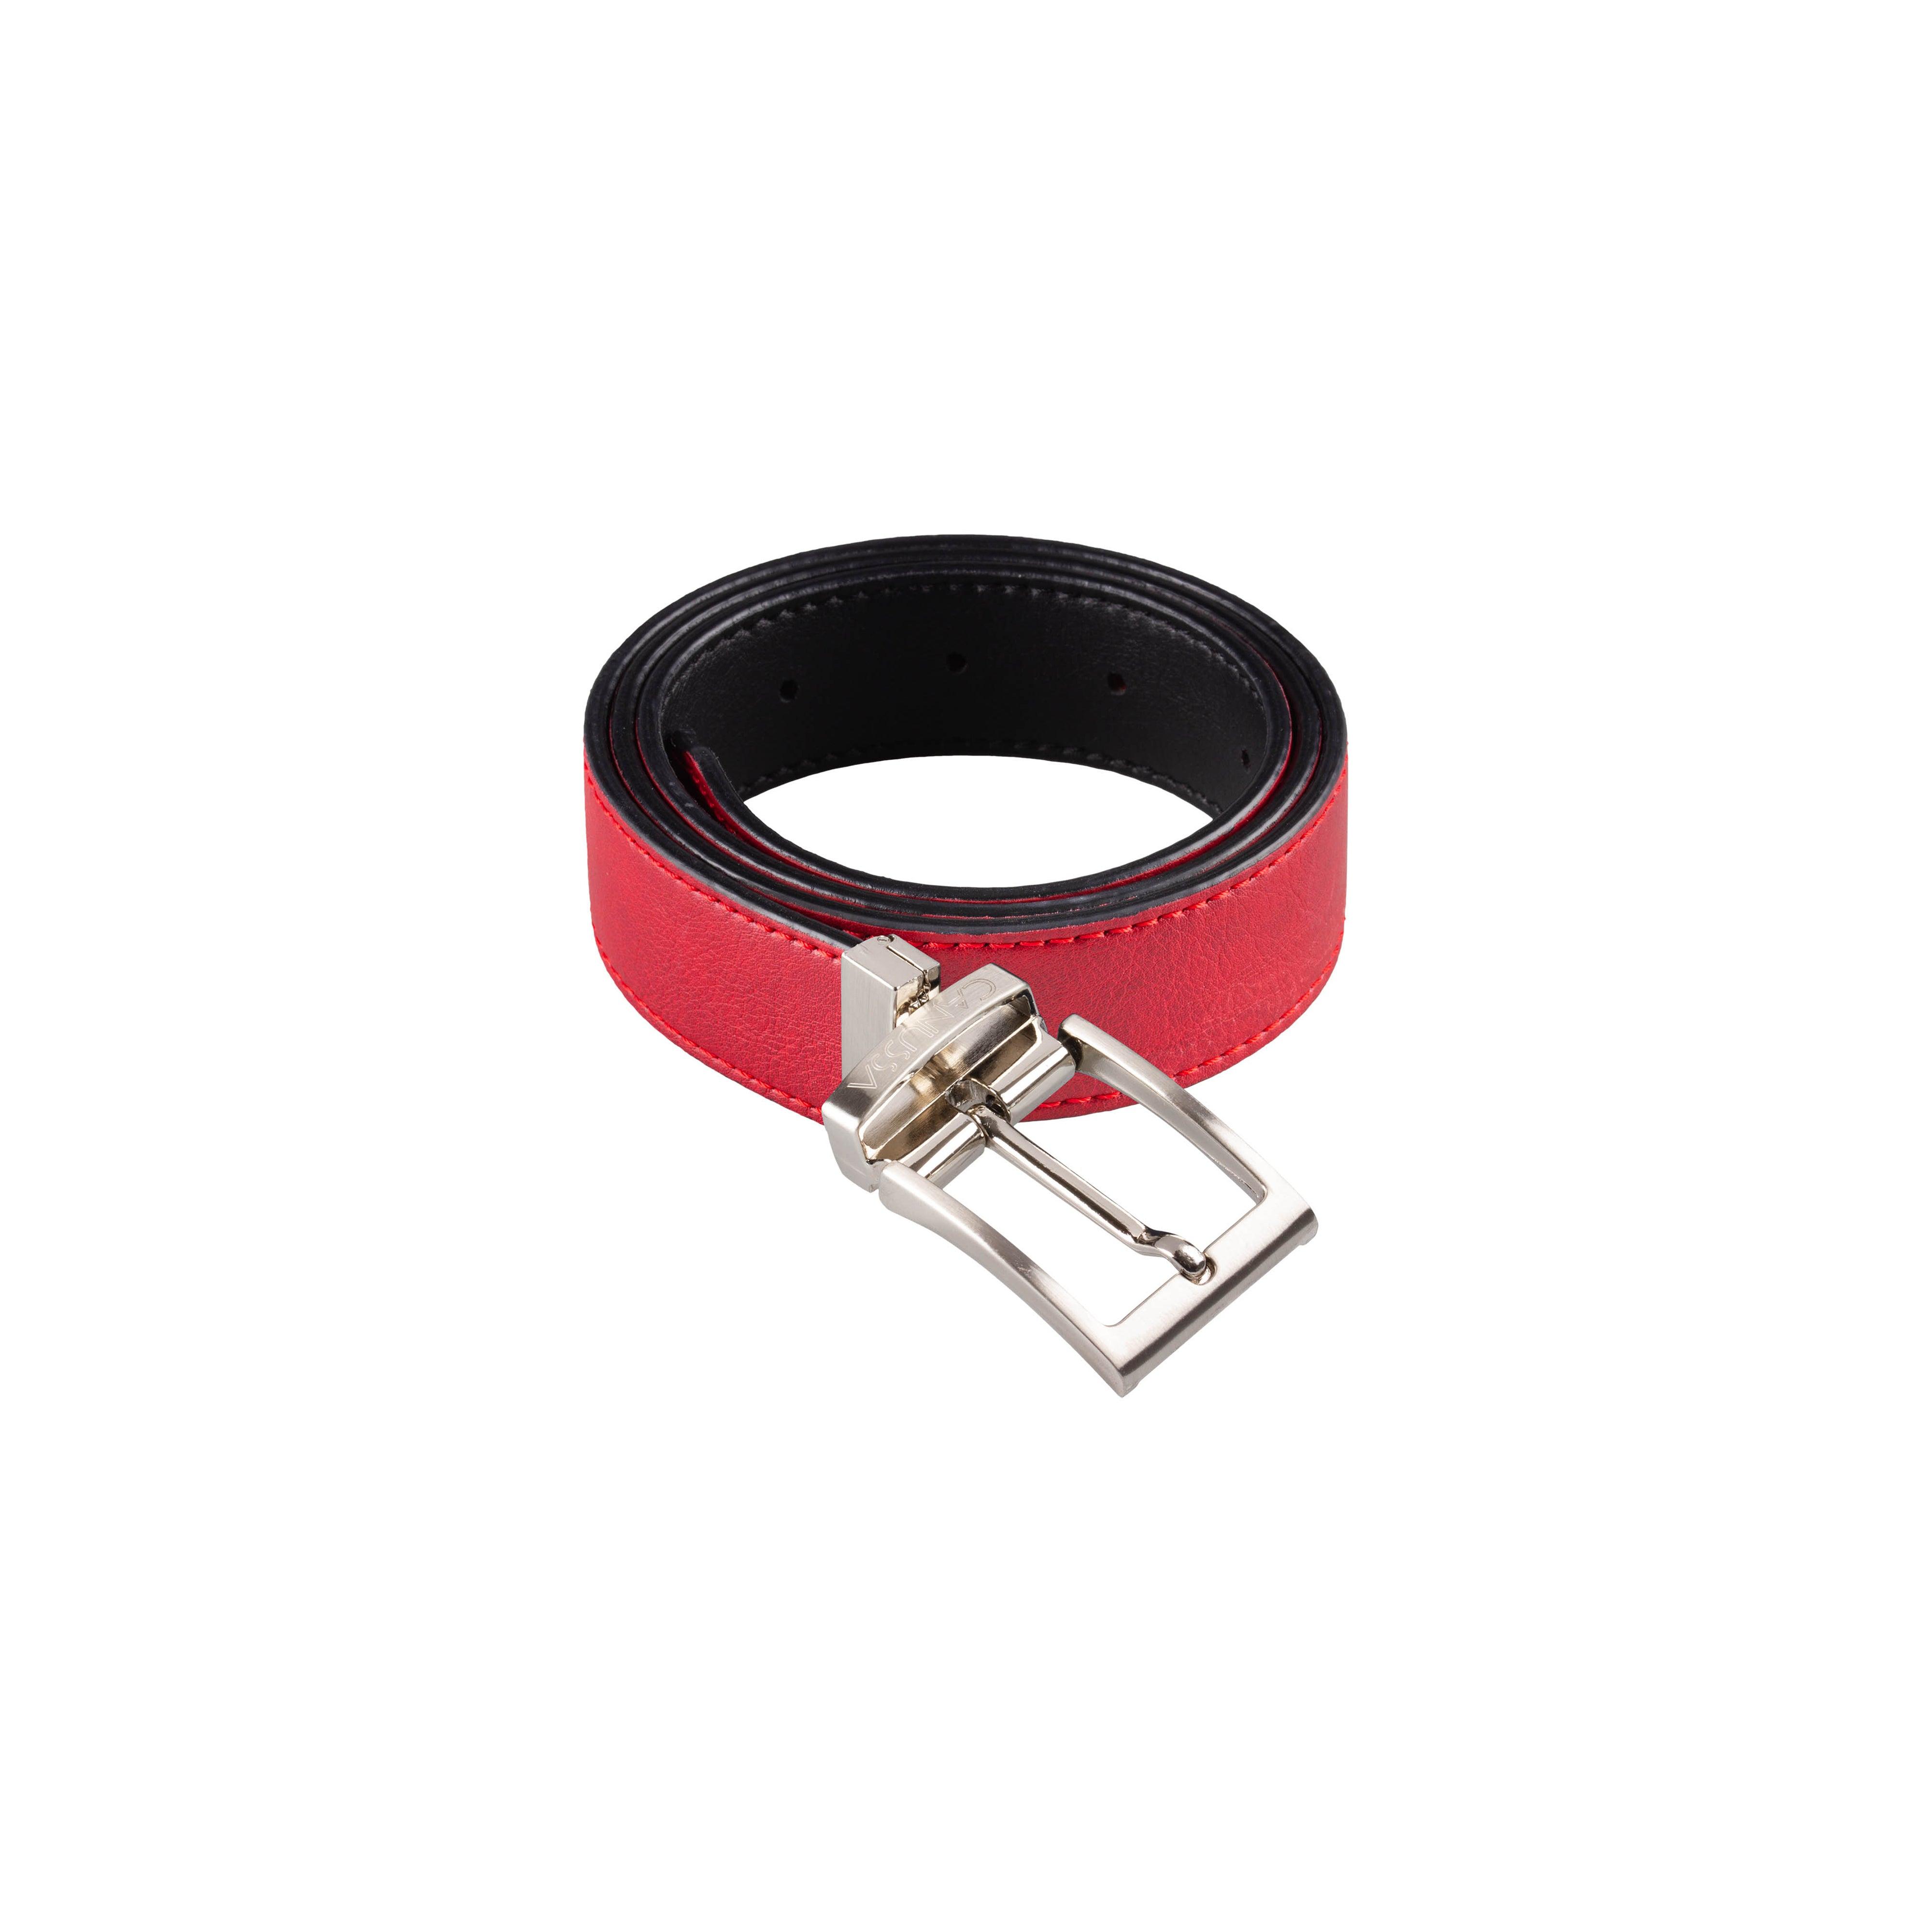 Reverse Vegan Belt – Reversible Black/Red